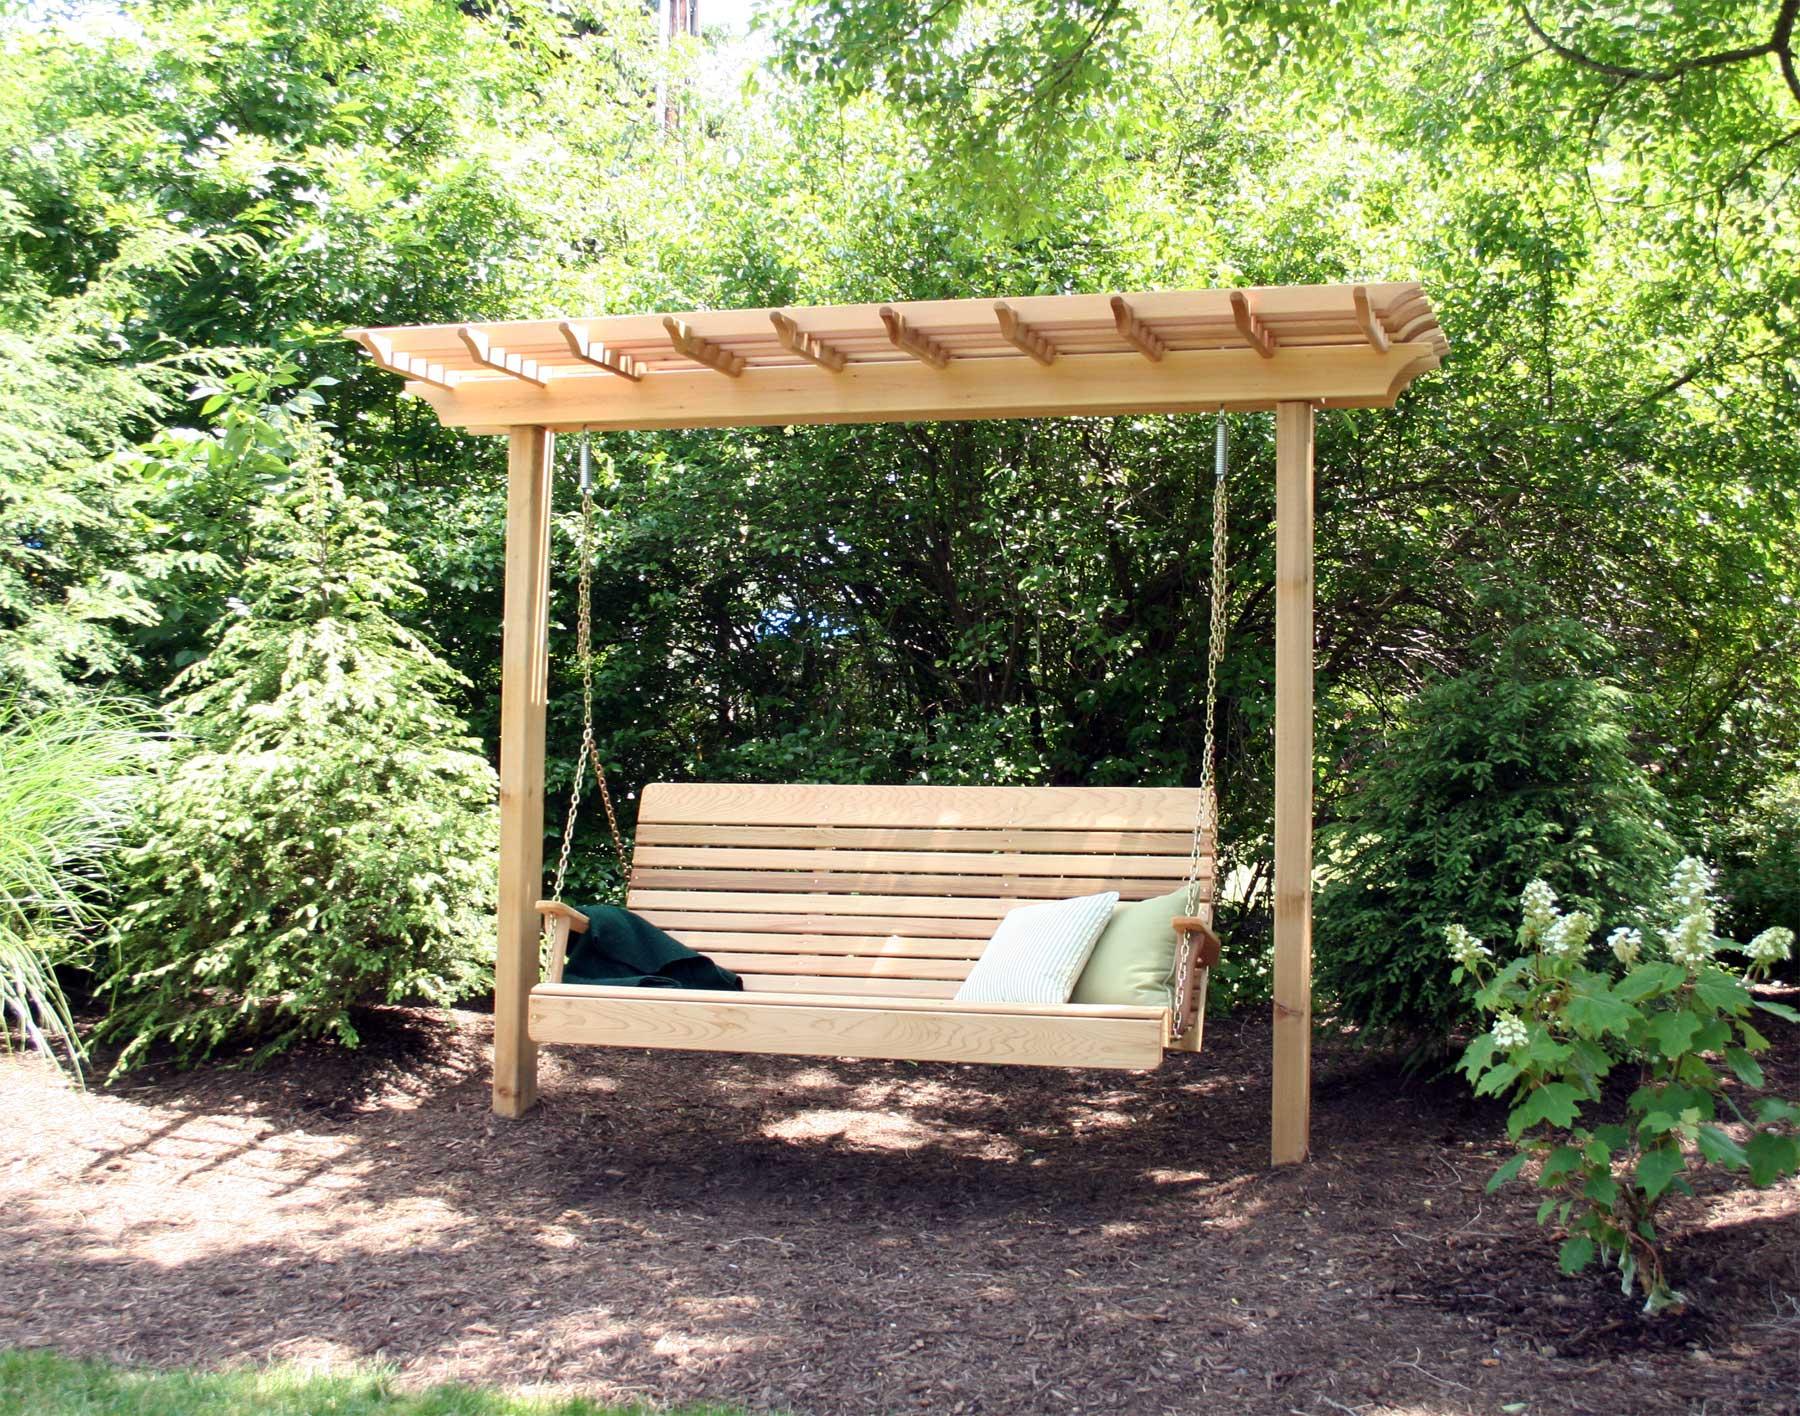 Porch Swing Image